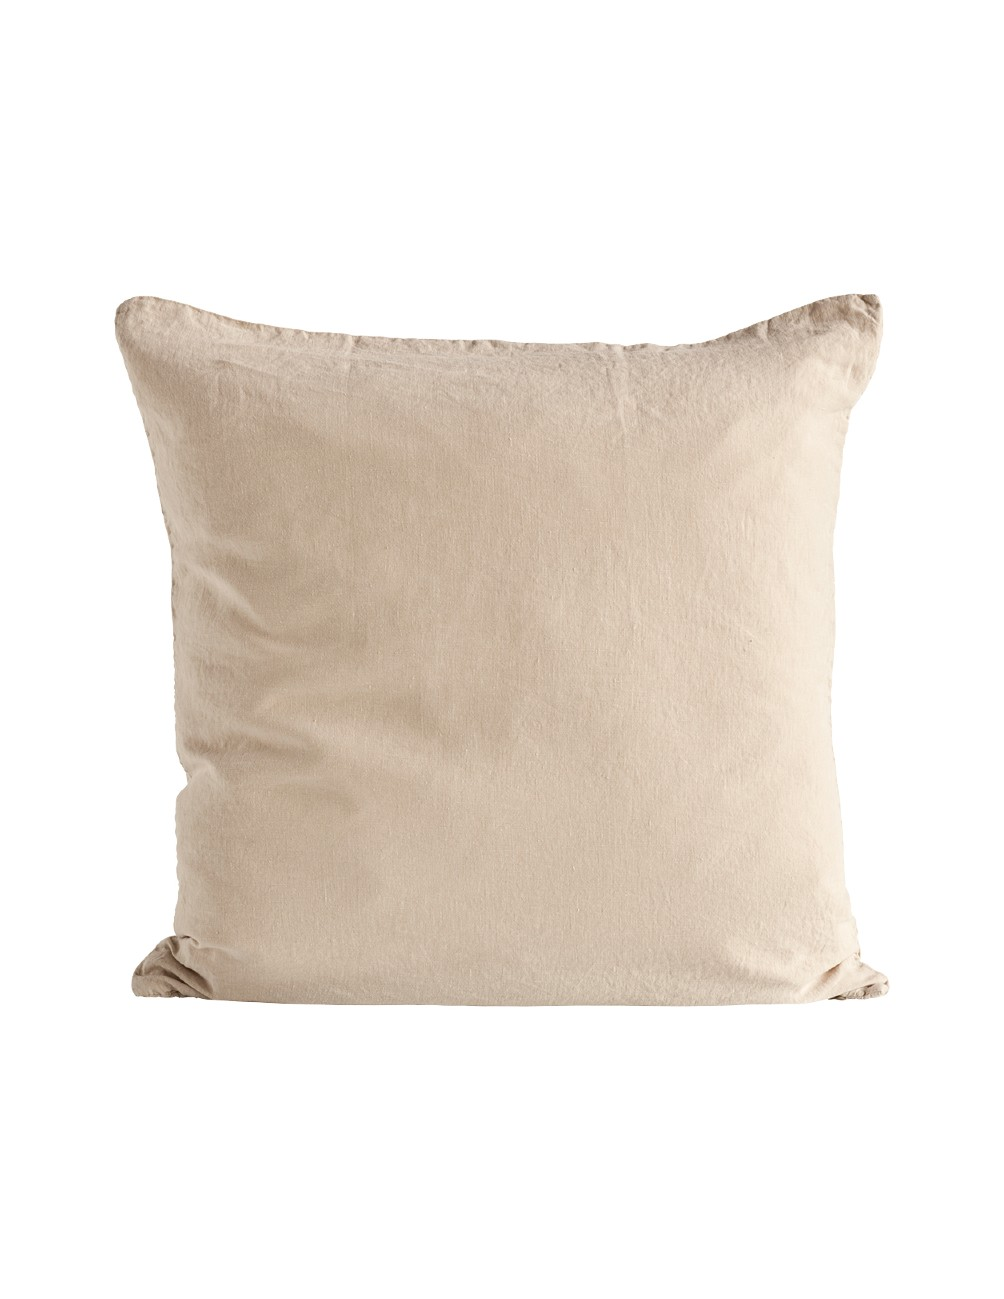 Sand Linen Cushion Cover 60x60cm